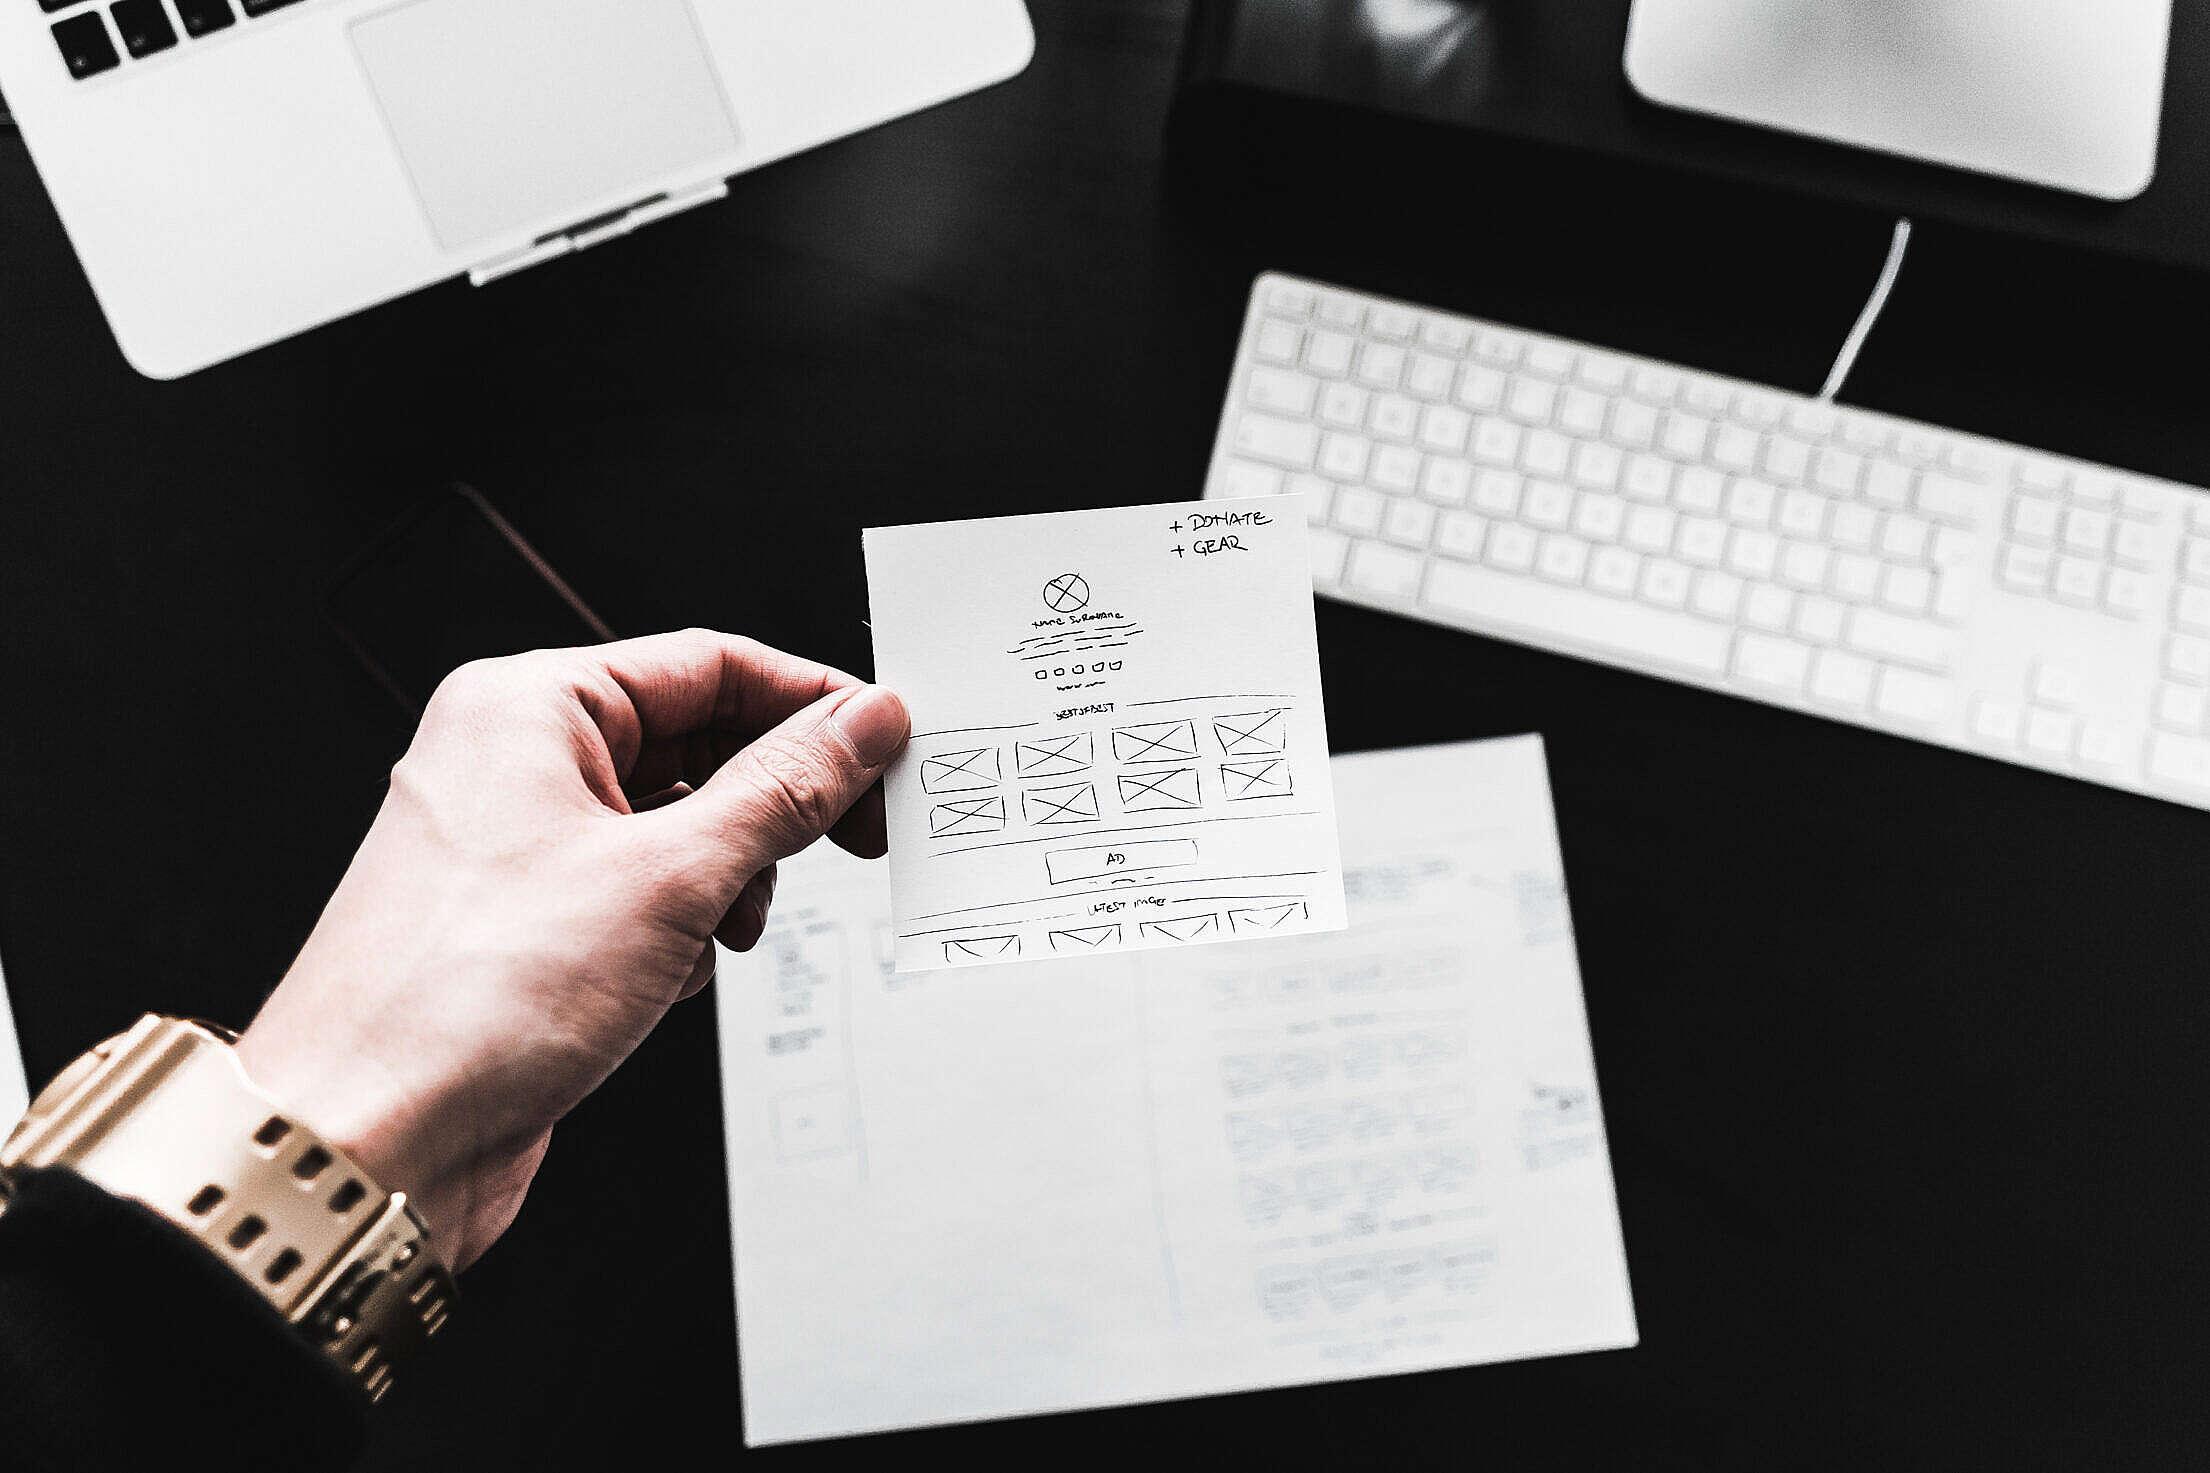 Designer Showing Web Design Layout Sketches Free Stock Photo